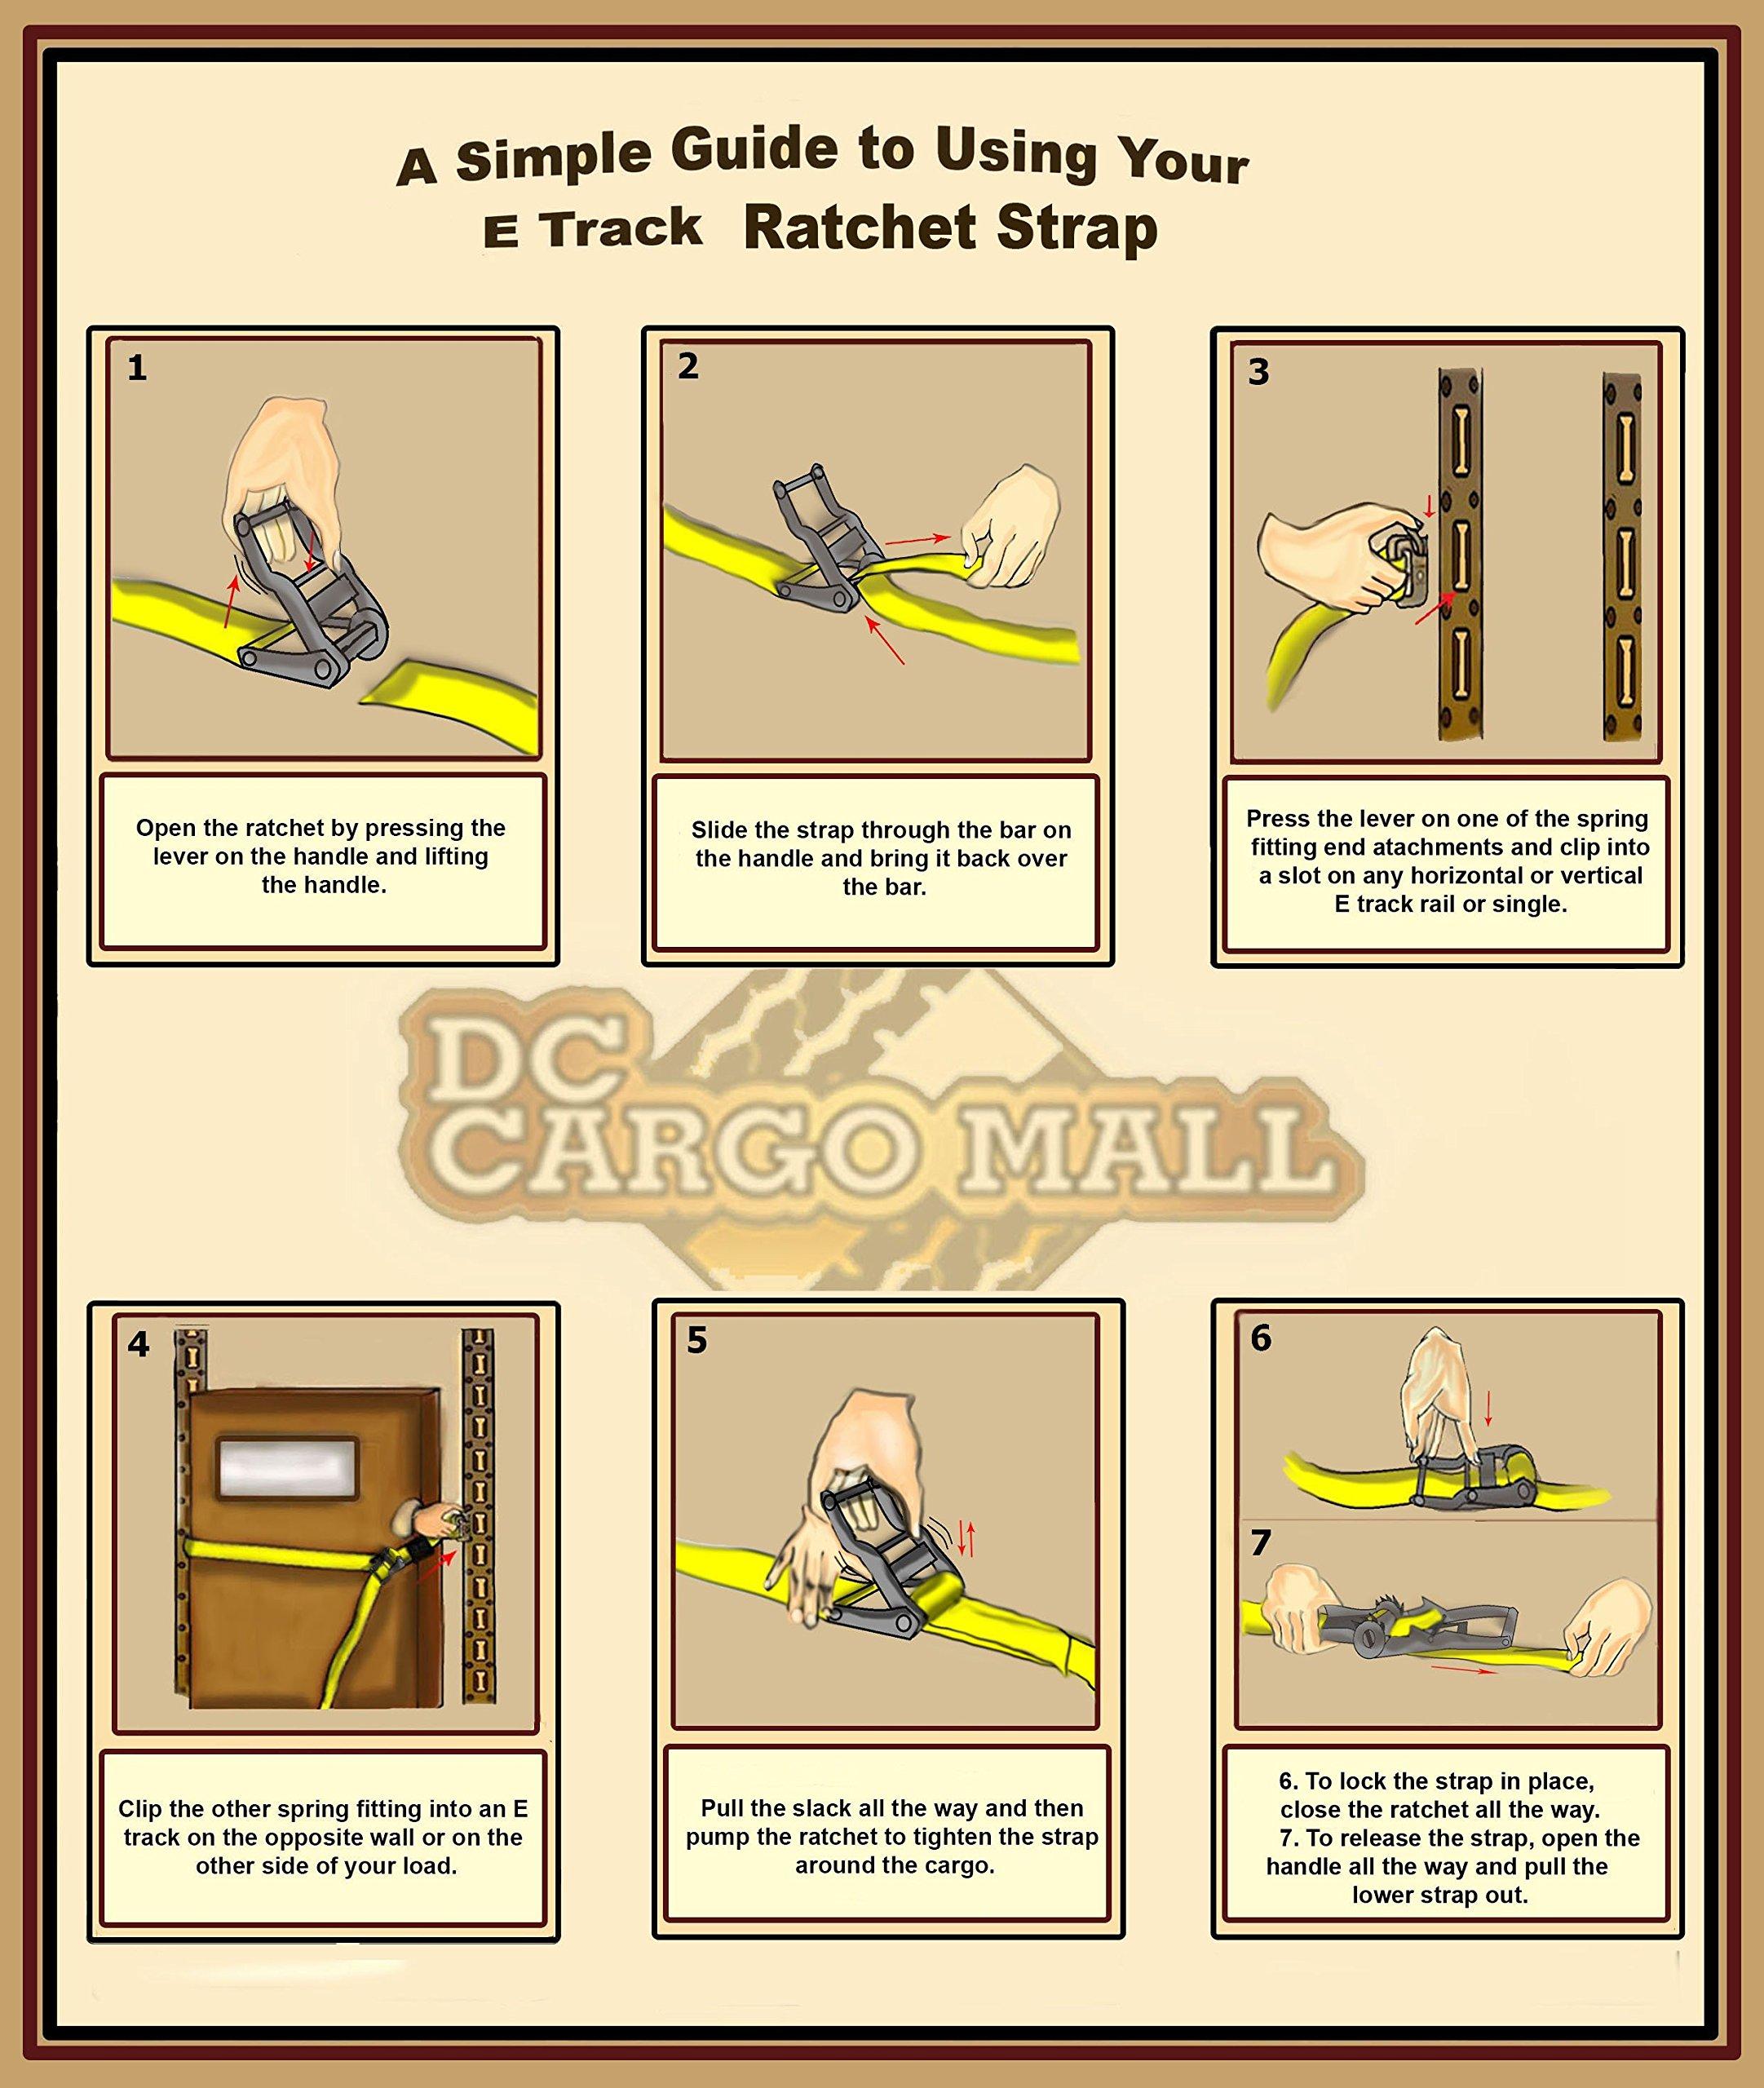 Premium Ratchet Strap for E Track MADE IN USA for Trailer, Trucks; Cargo van (20, 2 Inch x 12 Feet)